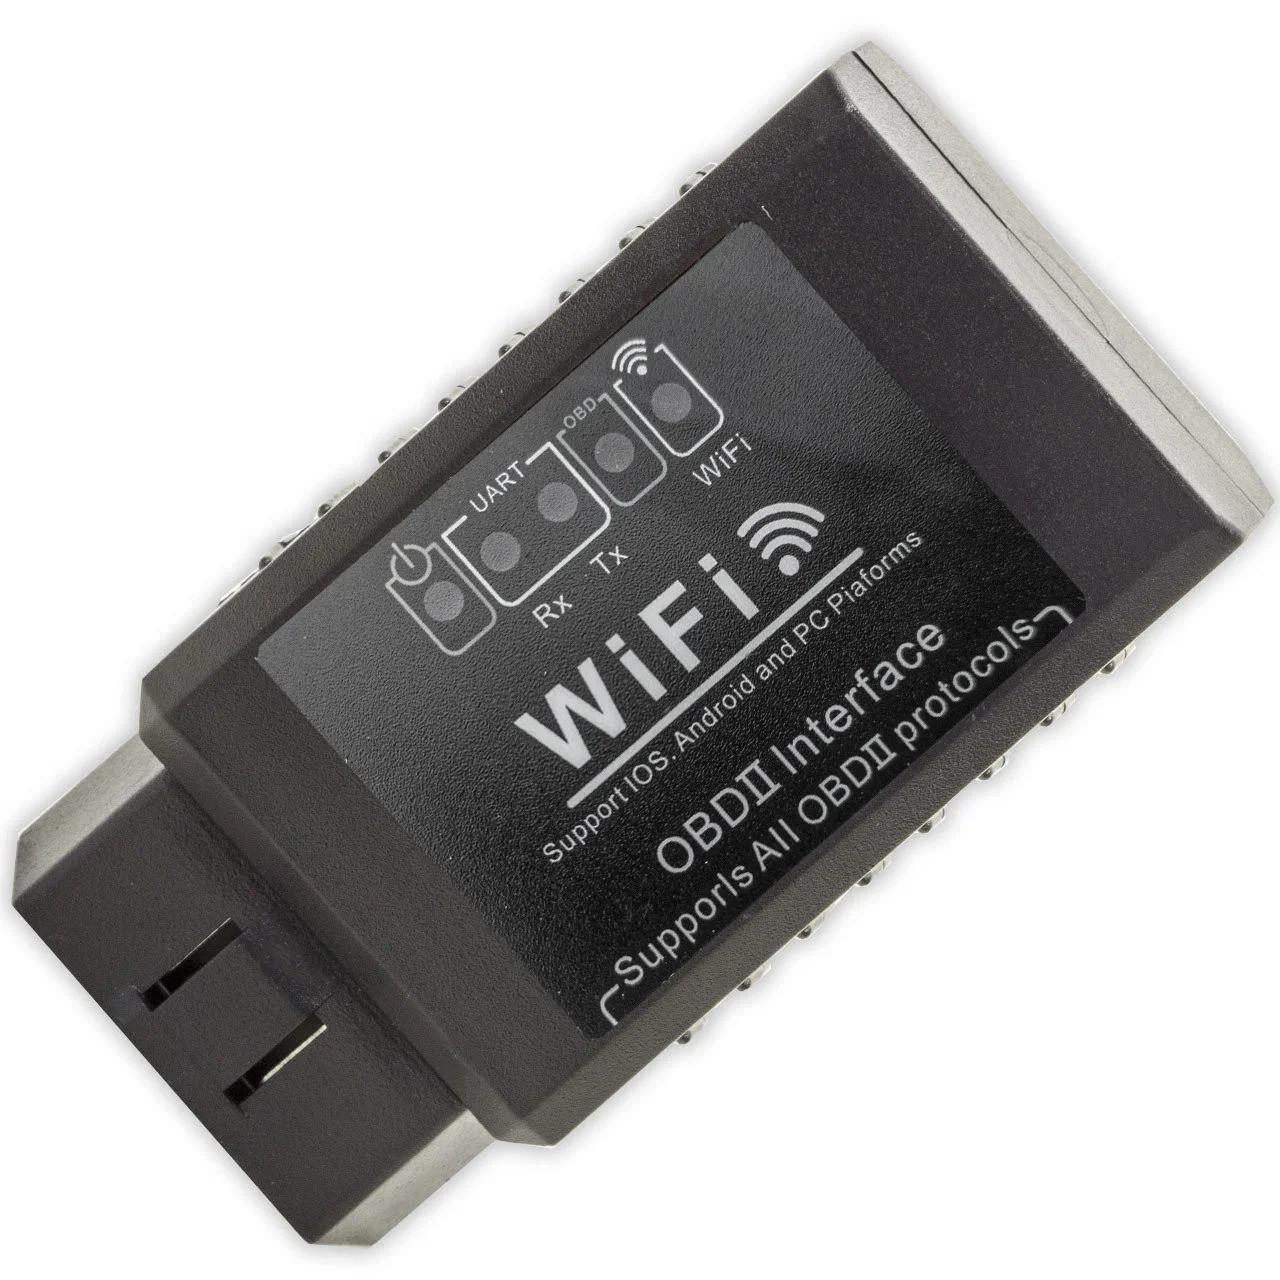 Автосканер OBD2(ОБД2)  ELM327(ЕЛМ327) SmartScan адаптер wifi